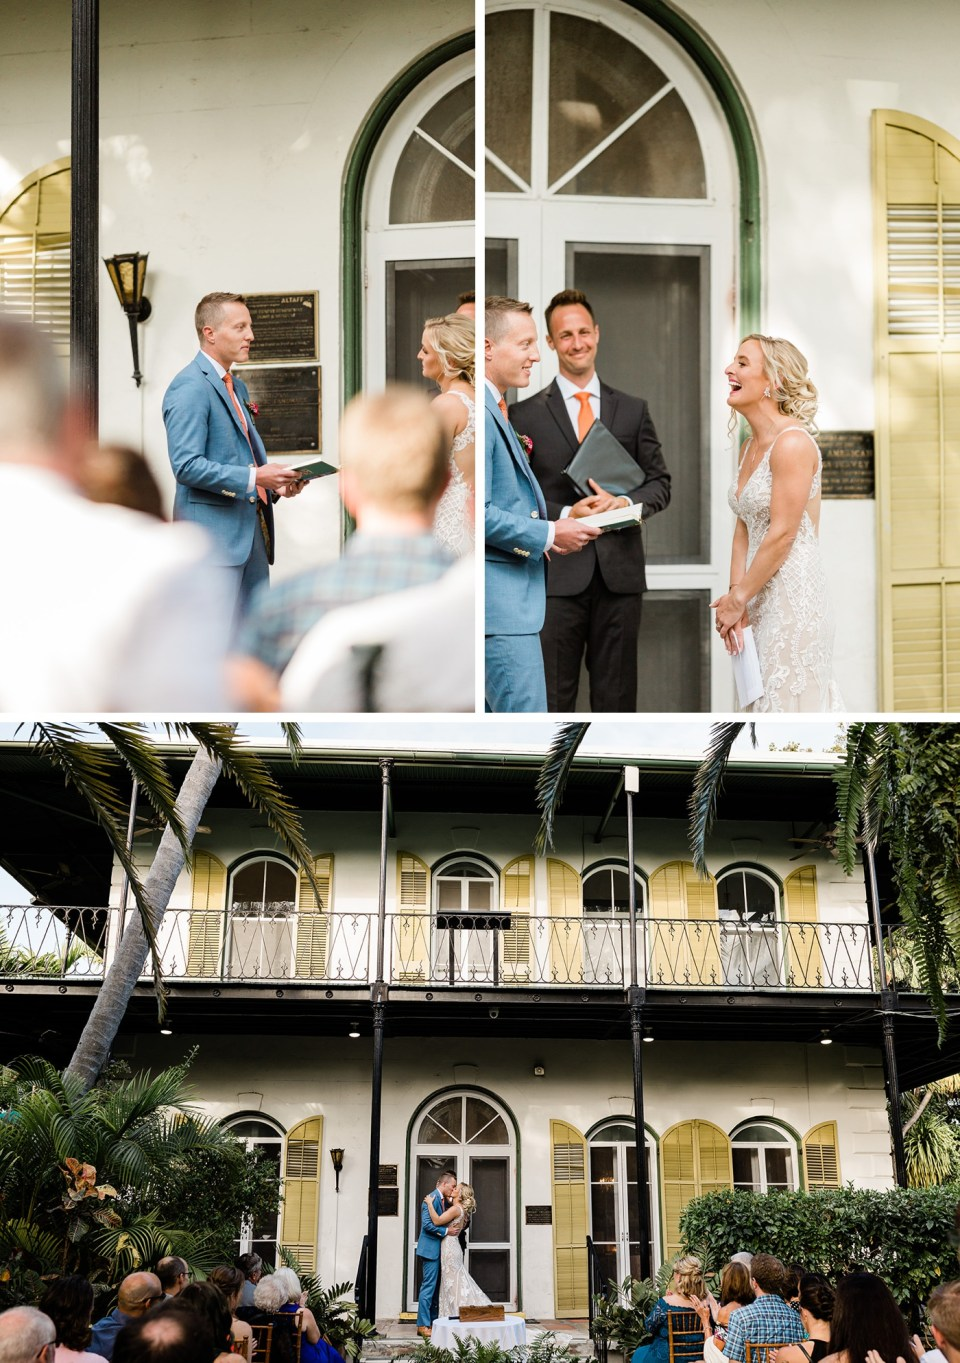 wedding ceremony at the Hemingway Home